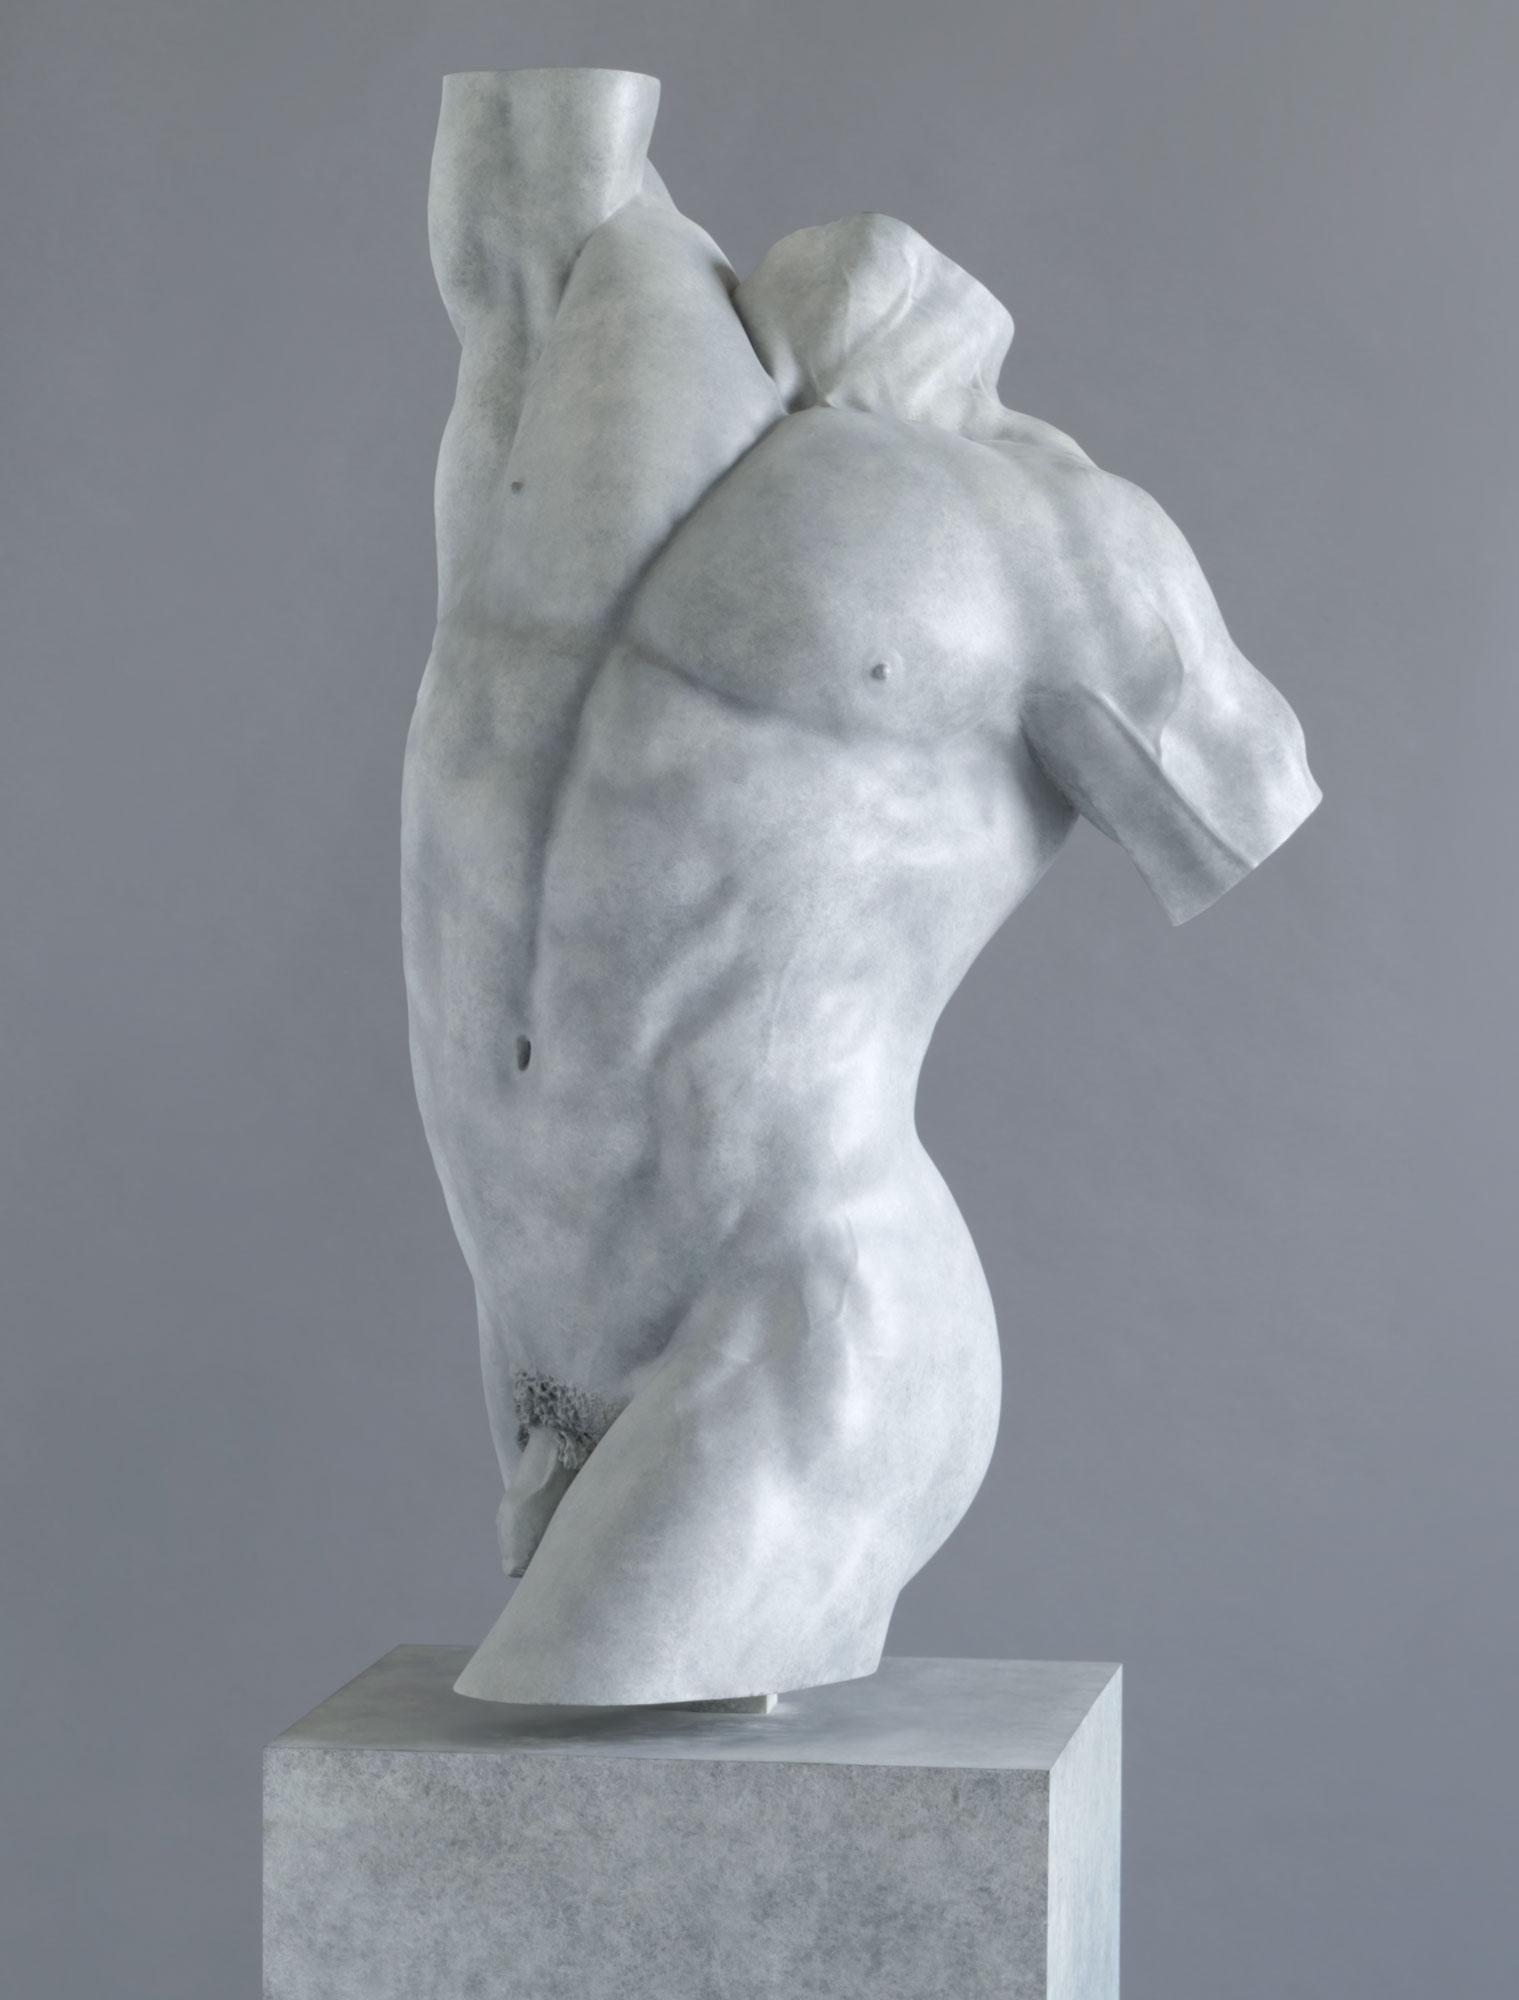 3. Apollo by Nick Bibby, Edition of 9, 83 x 21 x 24 inches (211 x 53 x 61cm).jpg